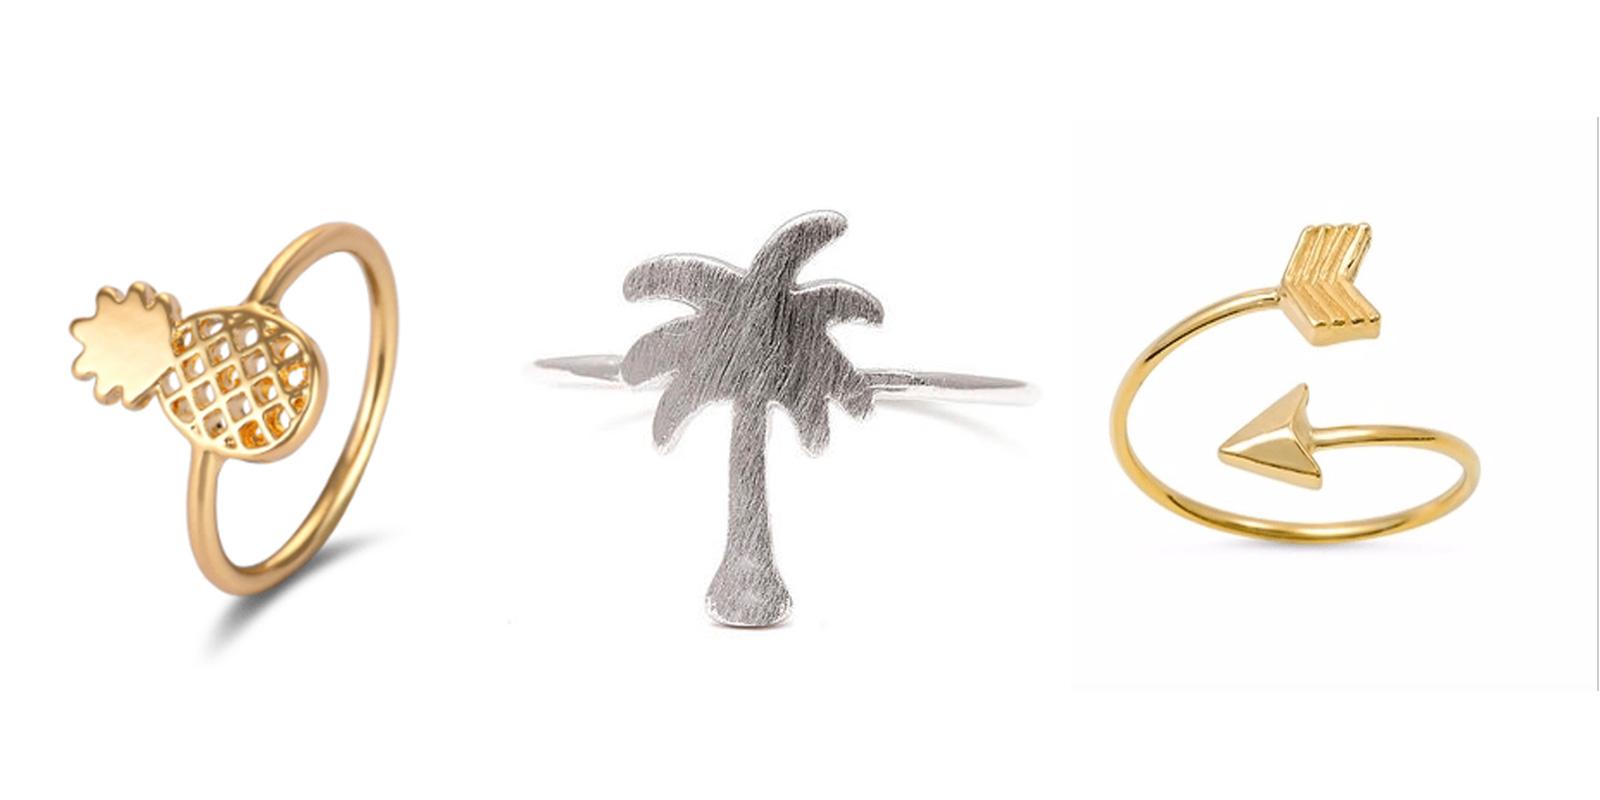 Aloha Jewellery Gemsita - KiteSista